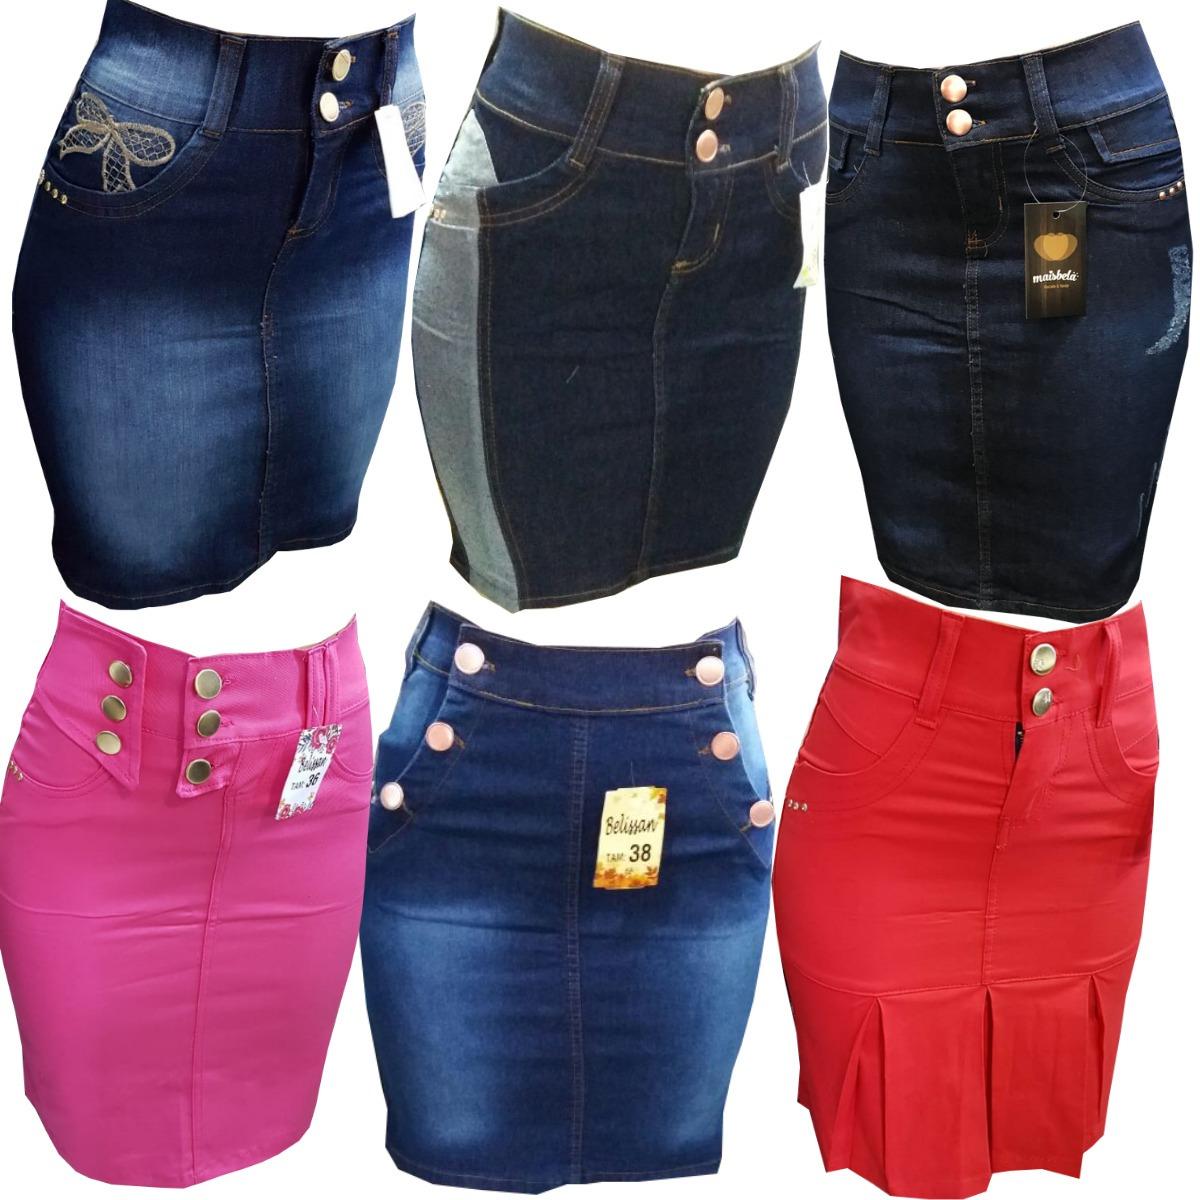 a2dbcf4a3 Kit 4 Saia Jeans Evangélica Moda Feminina Modelos Variados - R  164 ...